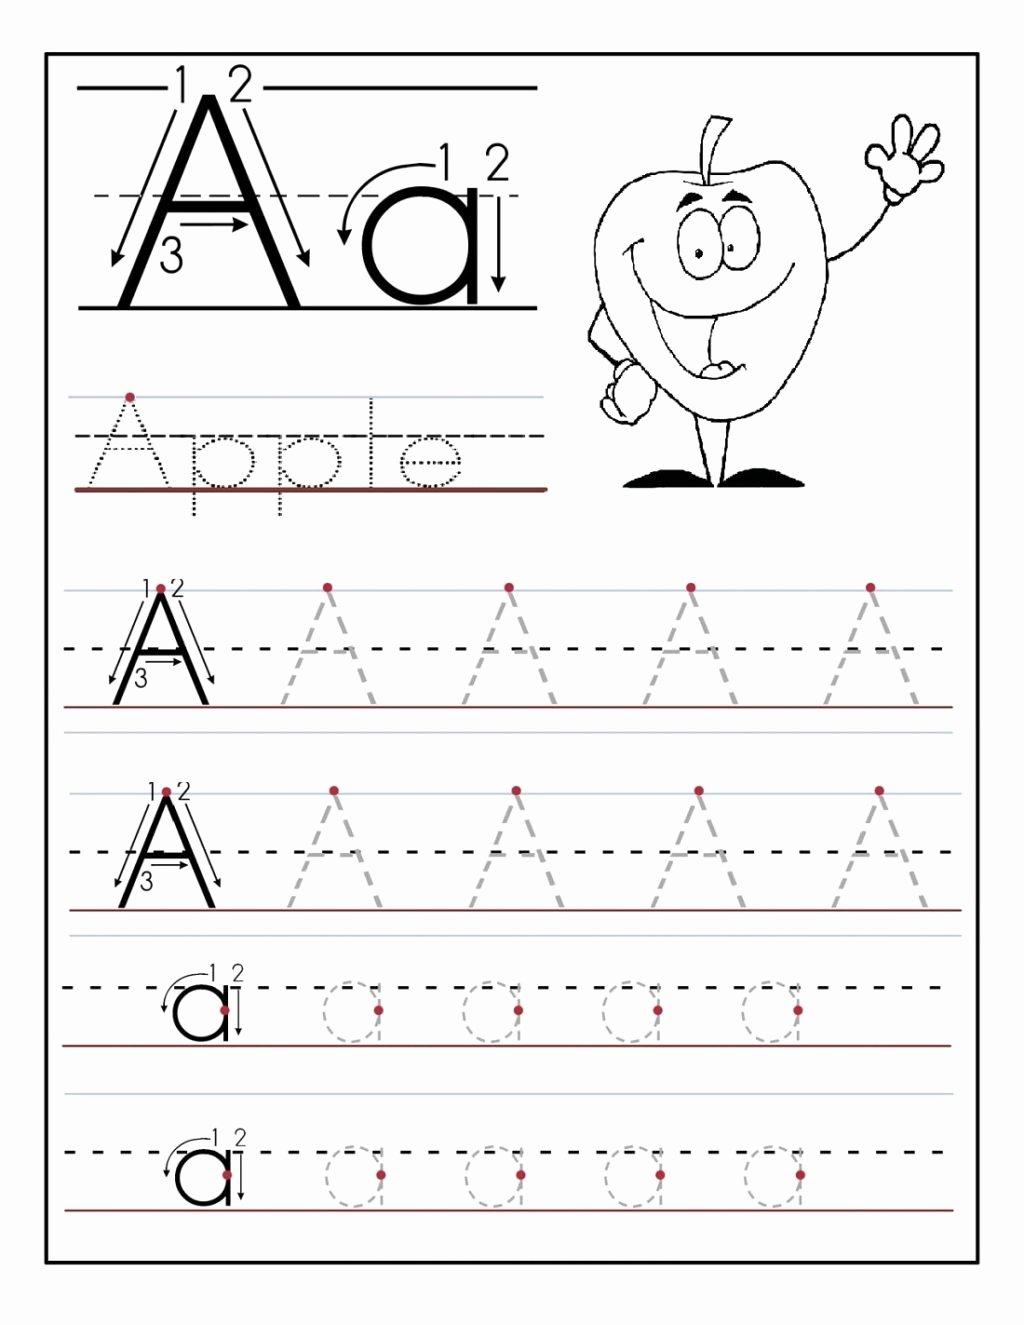 Free Tracing Lines Worksheets for Preschoolers Free Worksheet Kindergarten Alphabet Tracing Worksheets Page